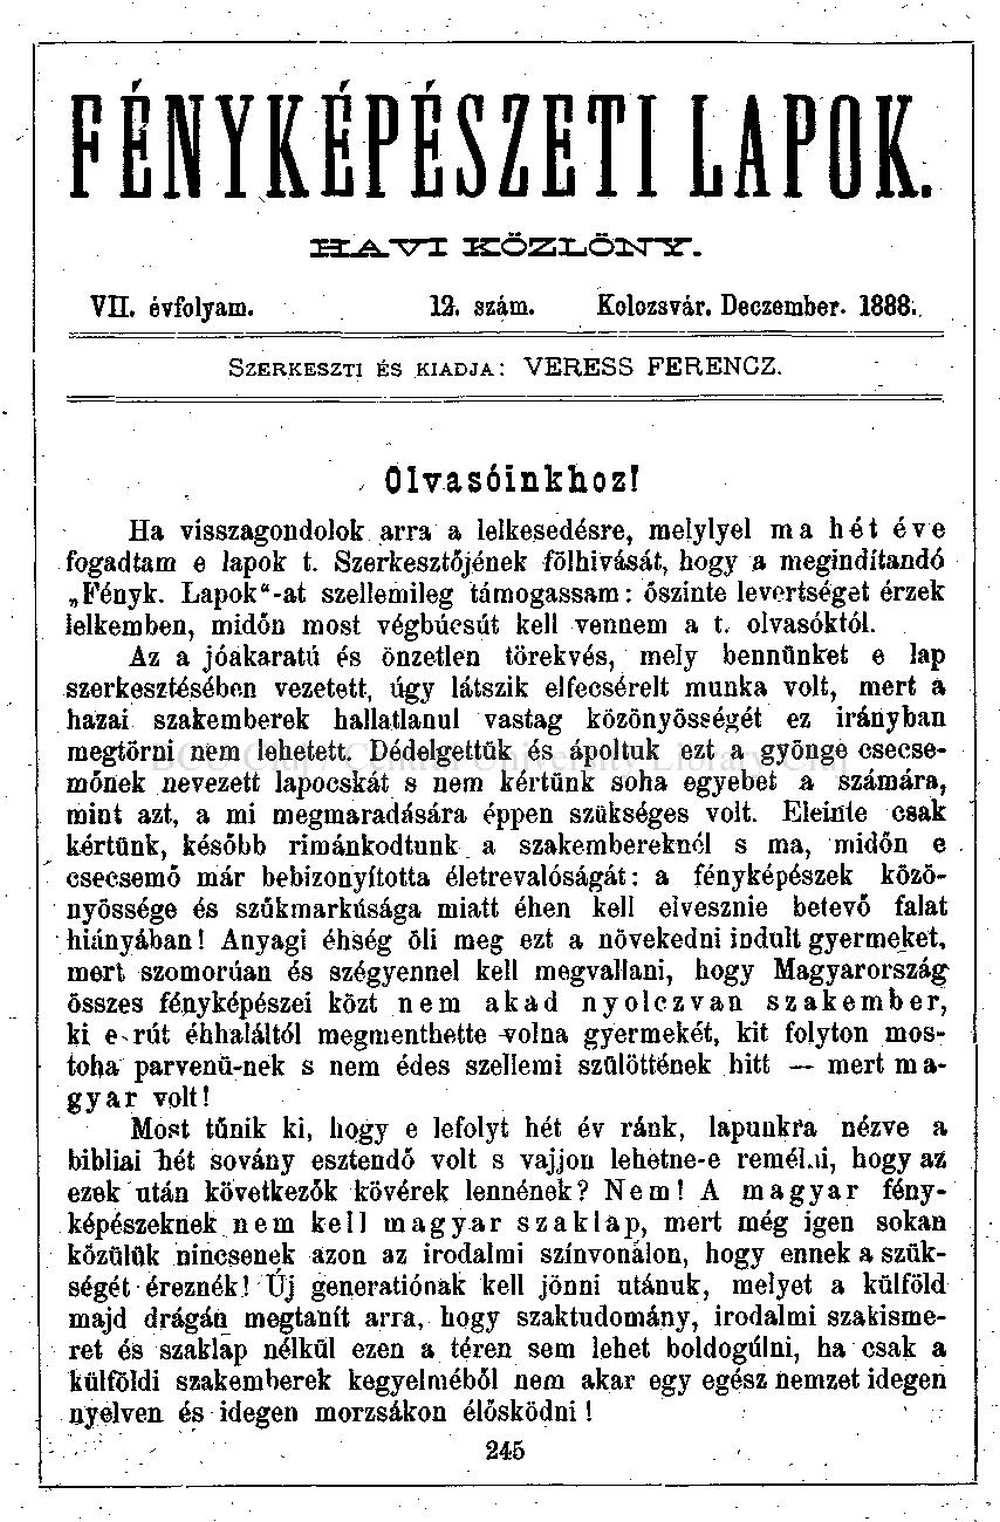 fenykepeszeti_lapok_1888_december_opti.jpg